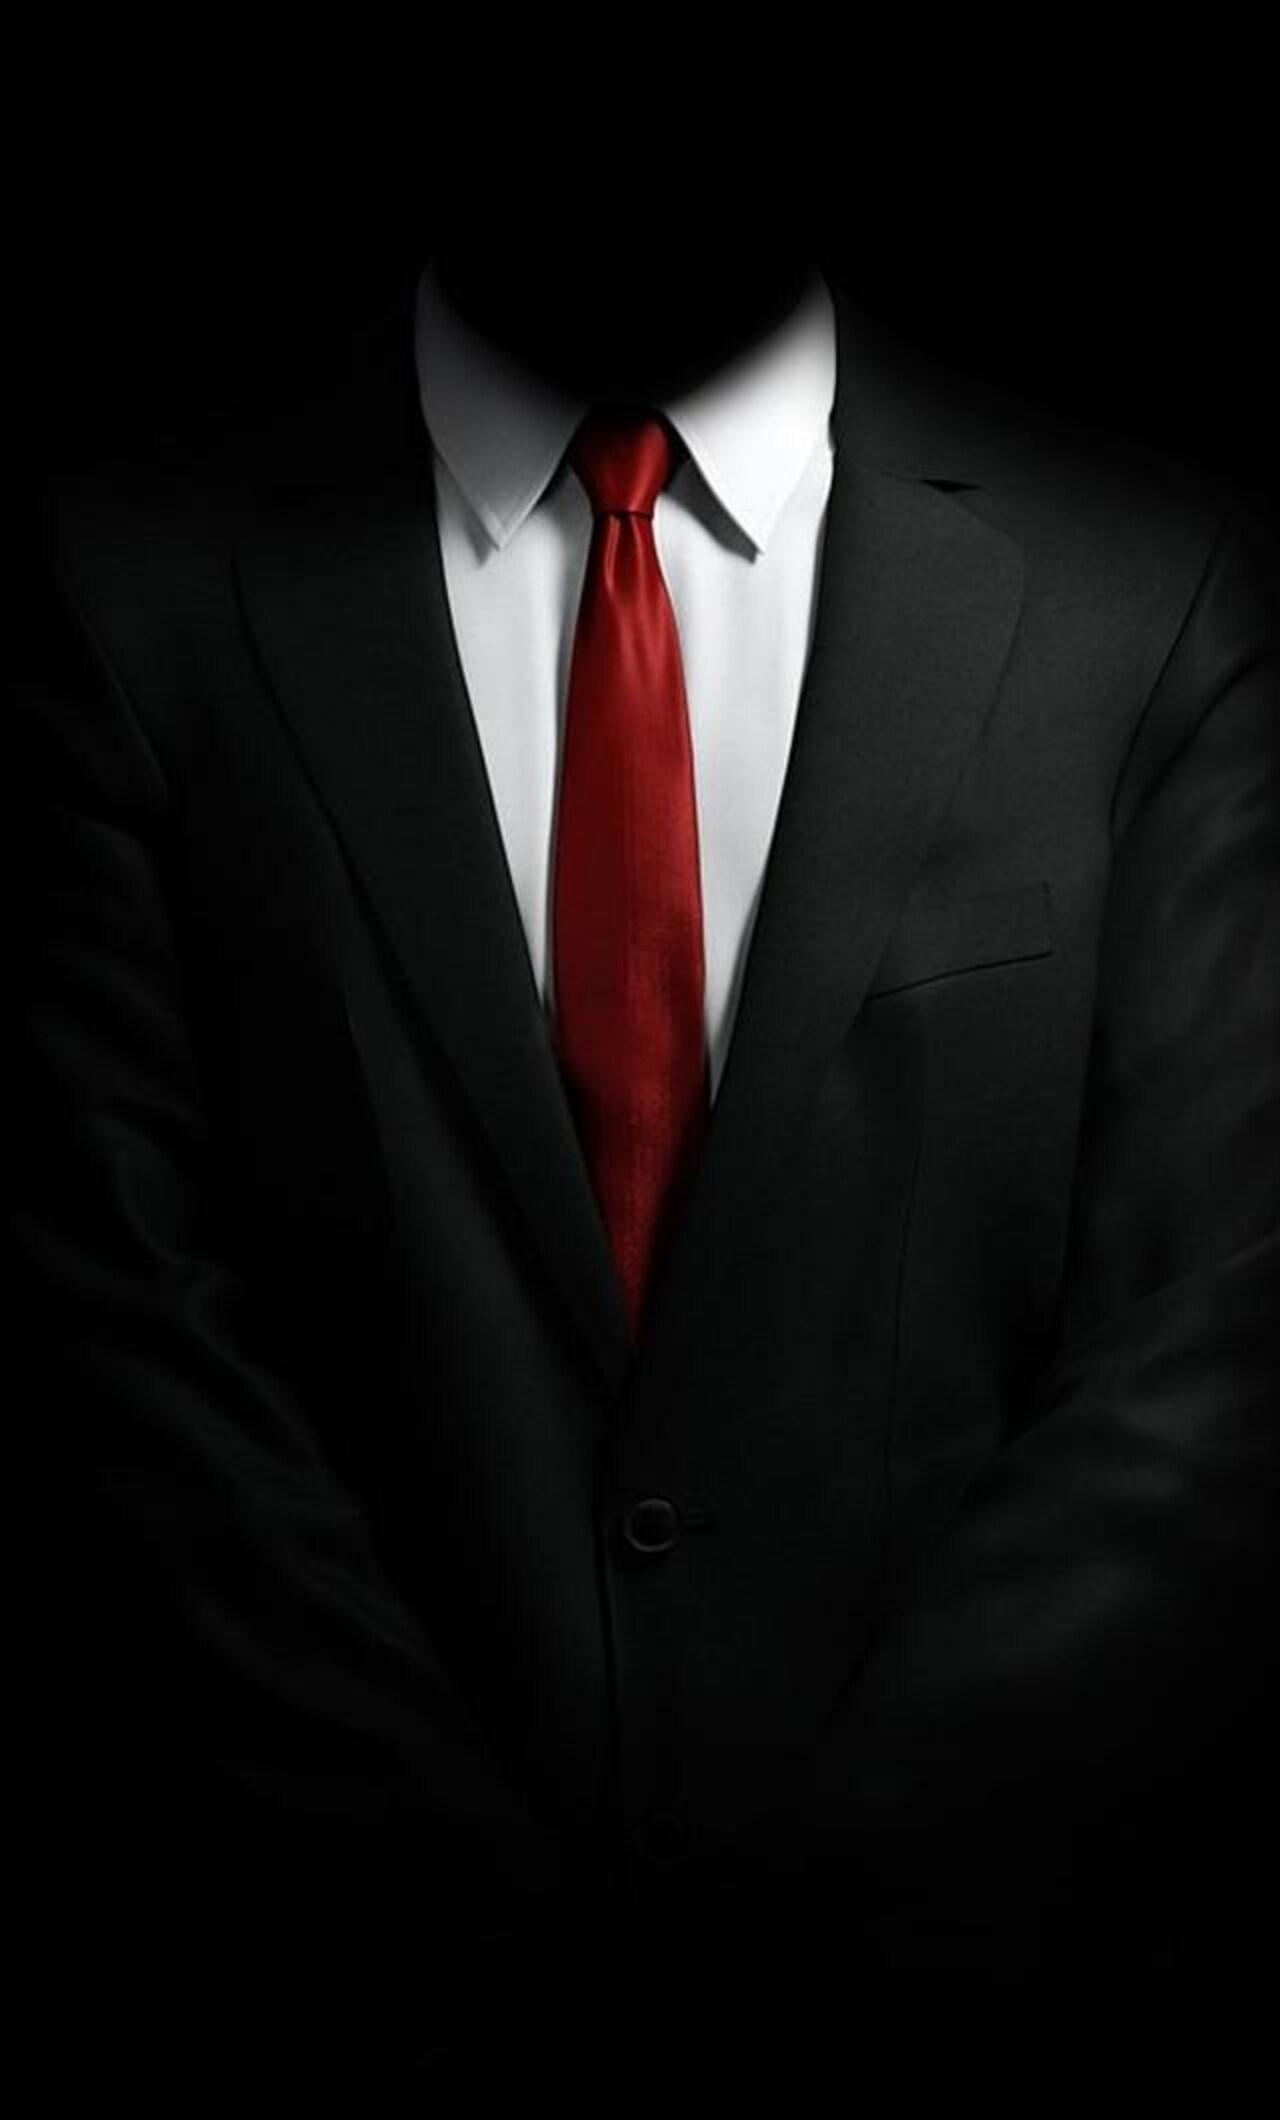 hitman-agent-47-suit-pic.jpg